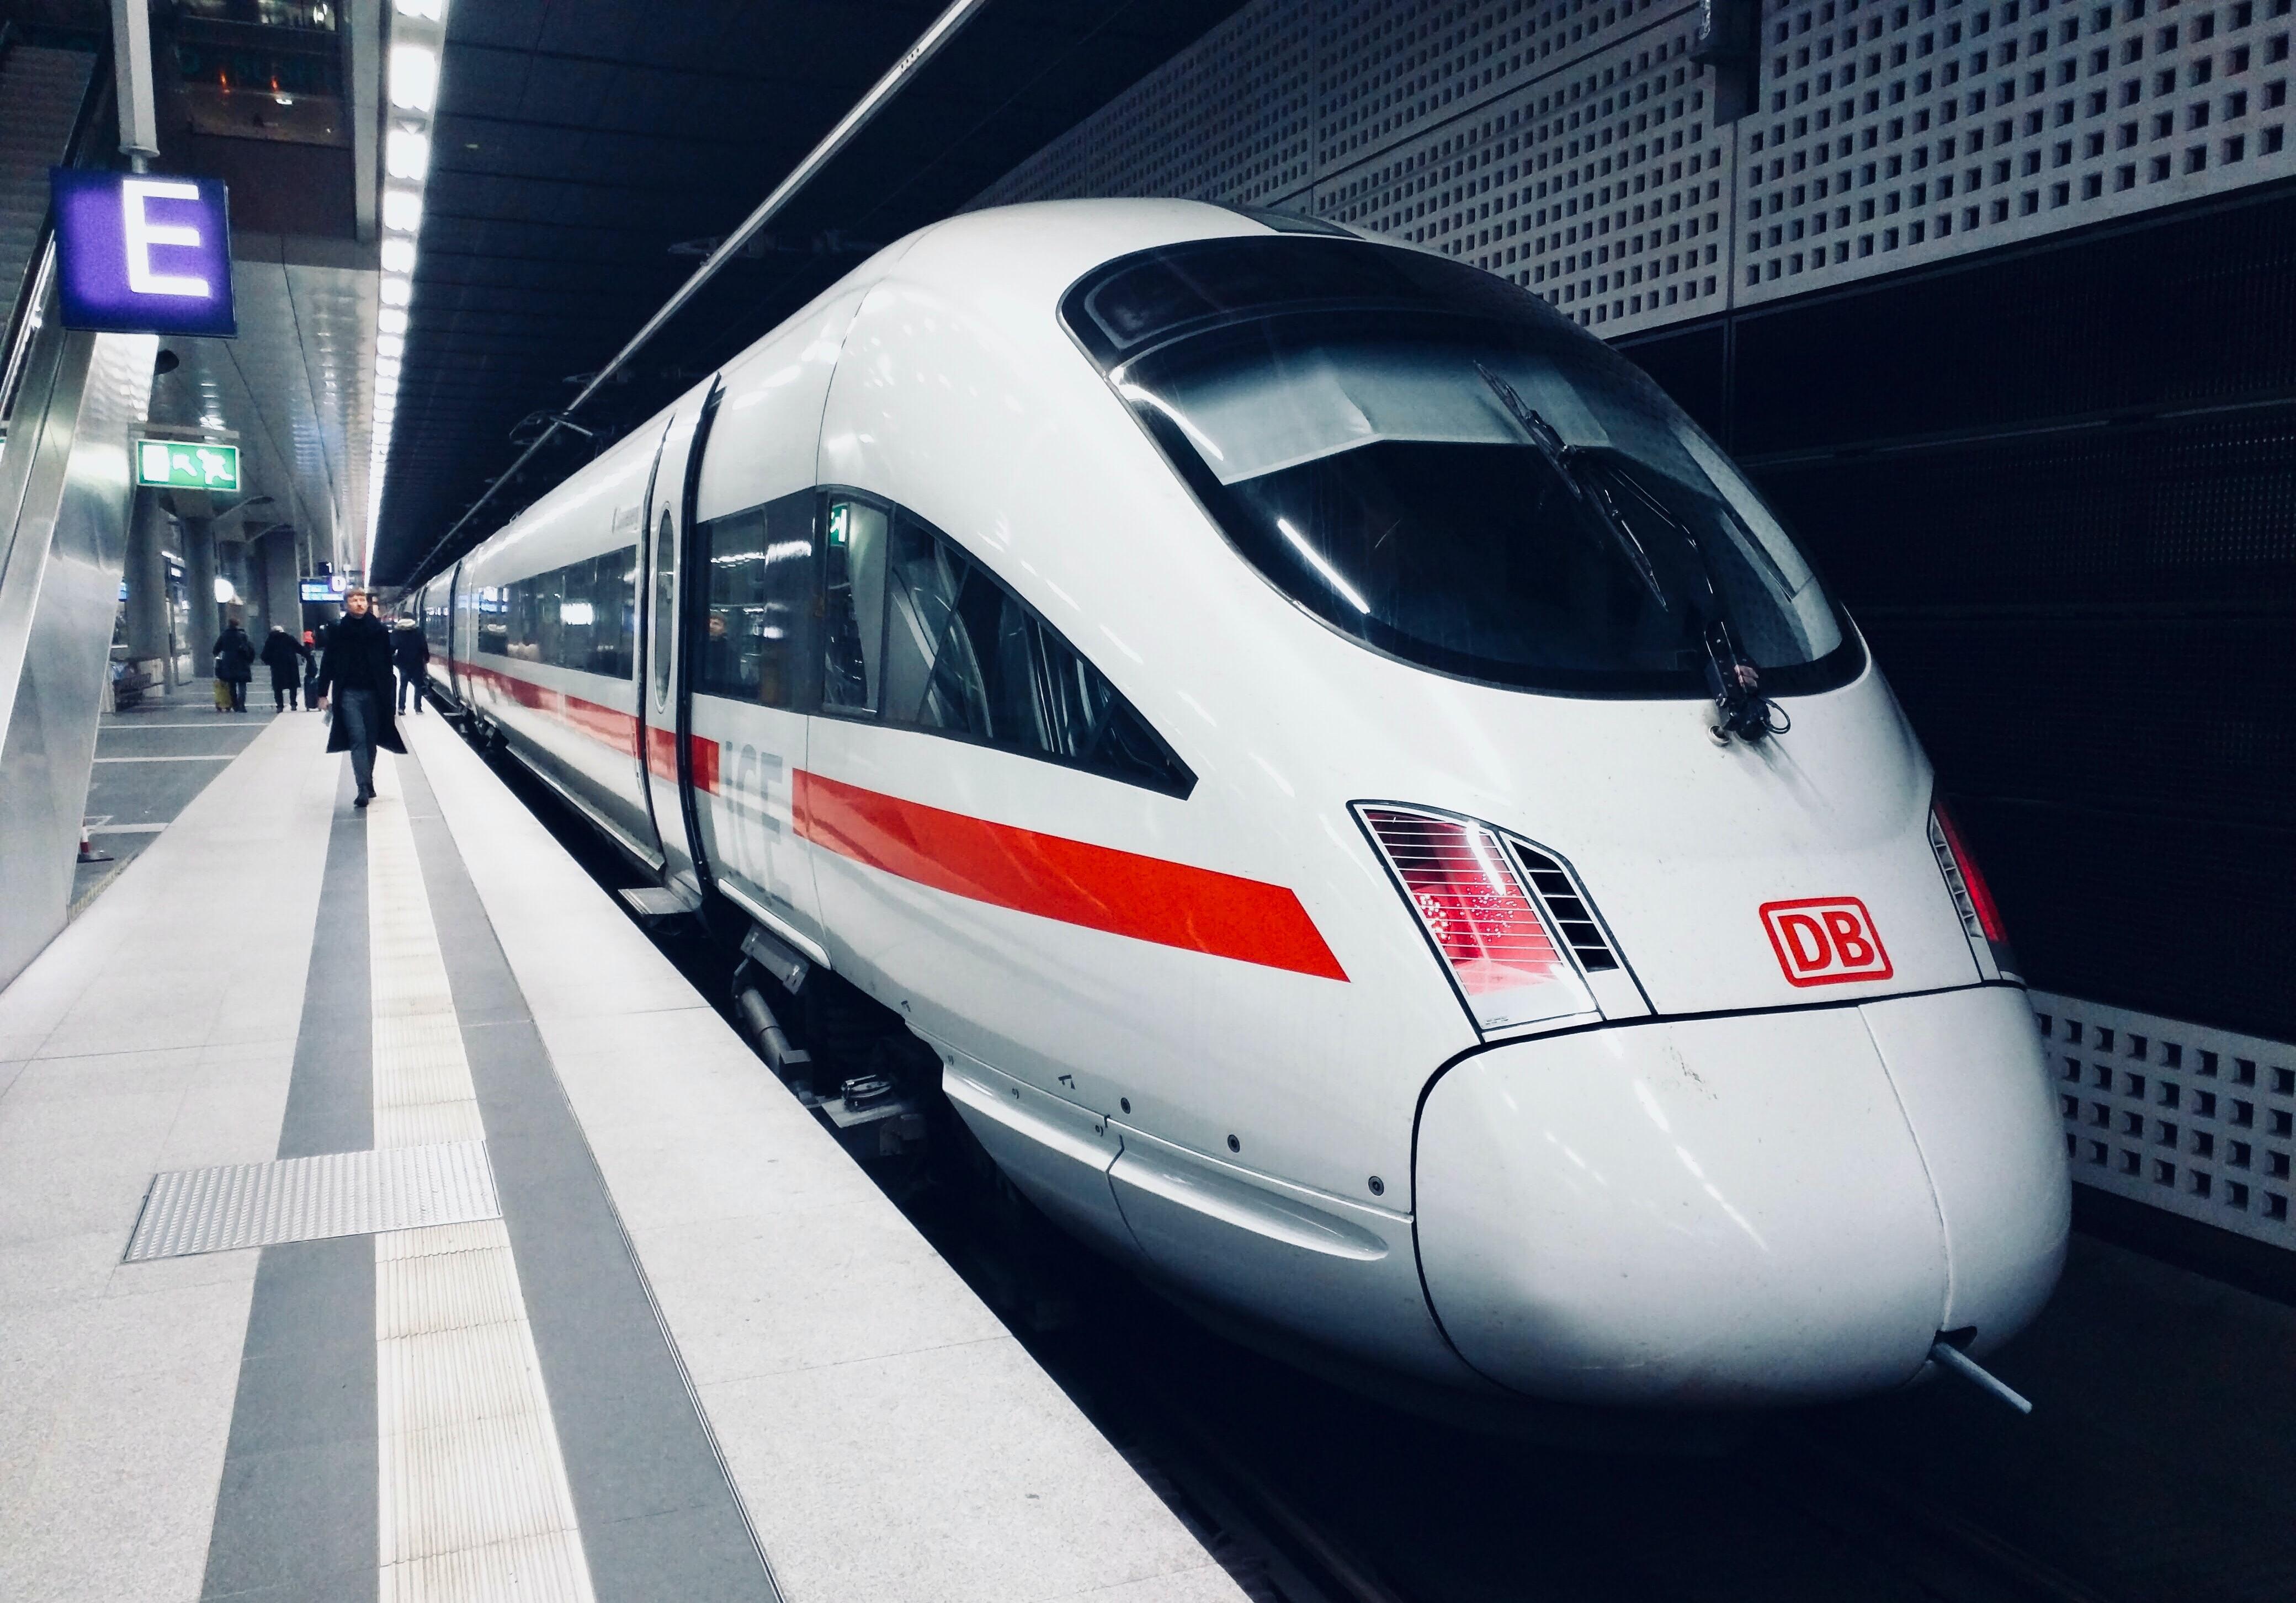 Mia-Platform aiuta i viaggiatori a spostarti in sicurezza